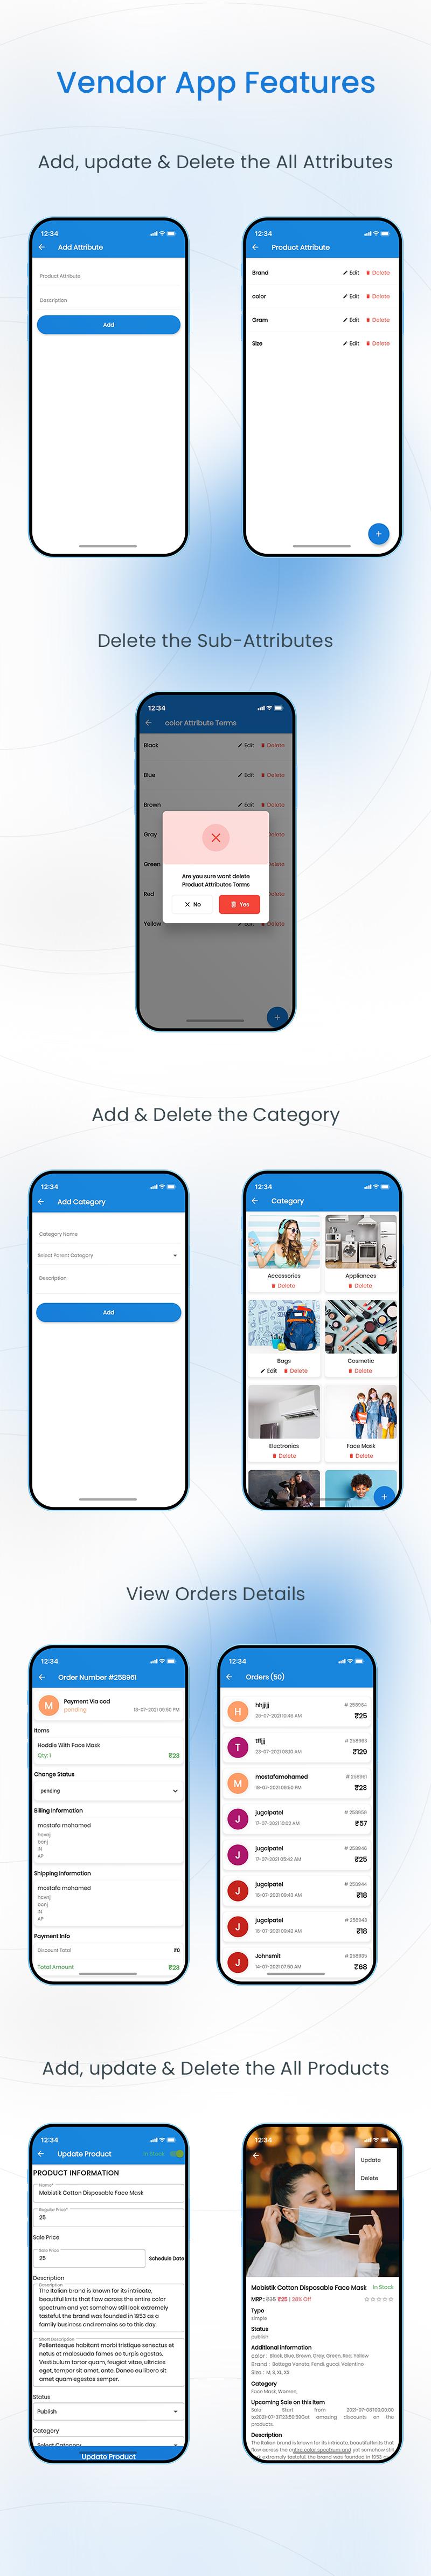 Woocommerce Admin and Dokan vendor app | Store Manager | Iqonic Design woocommerce admin and dokan vendor app Store Manager 03 vendor